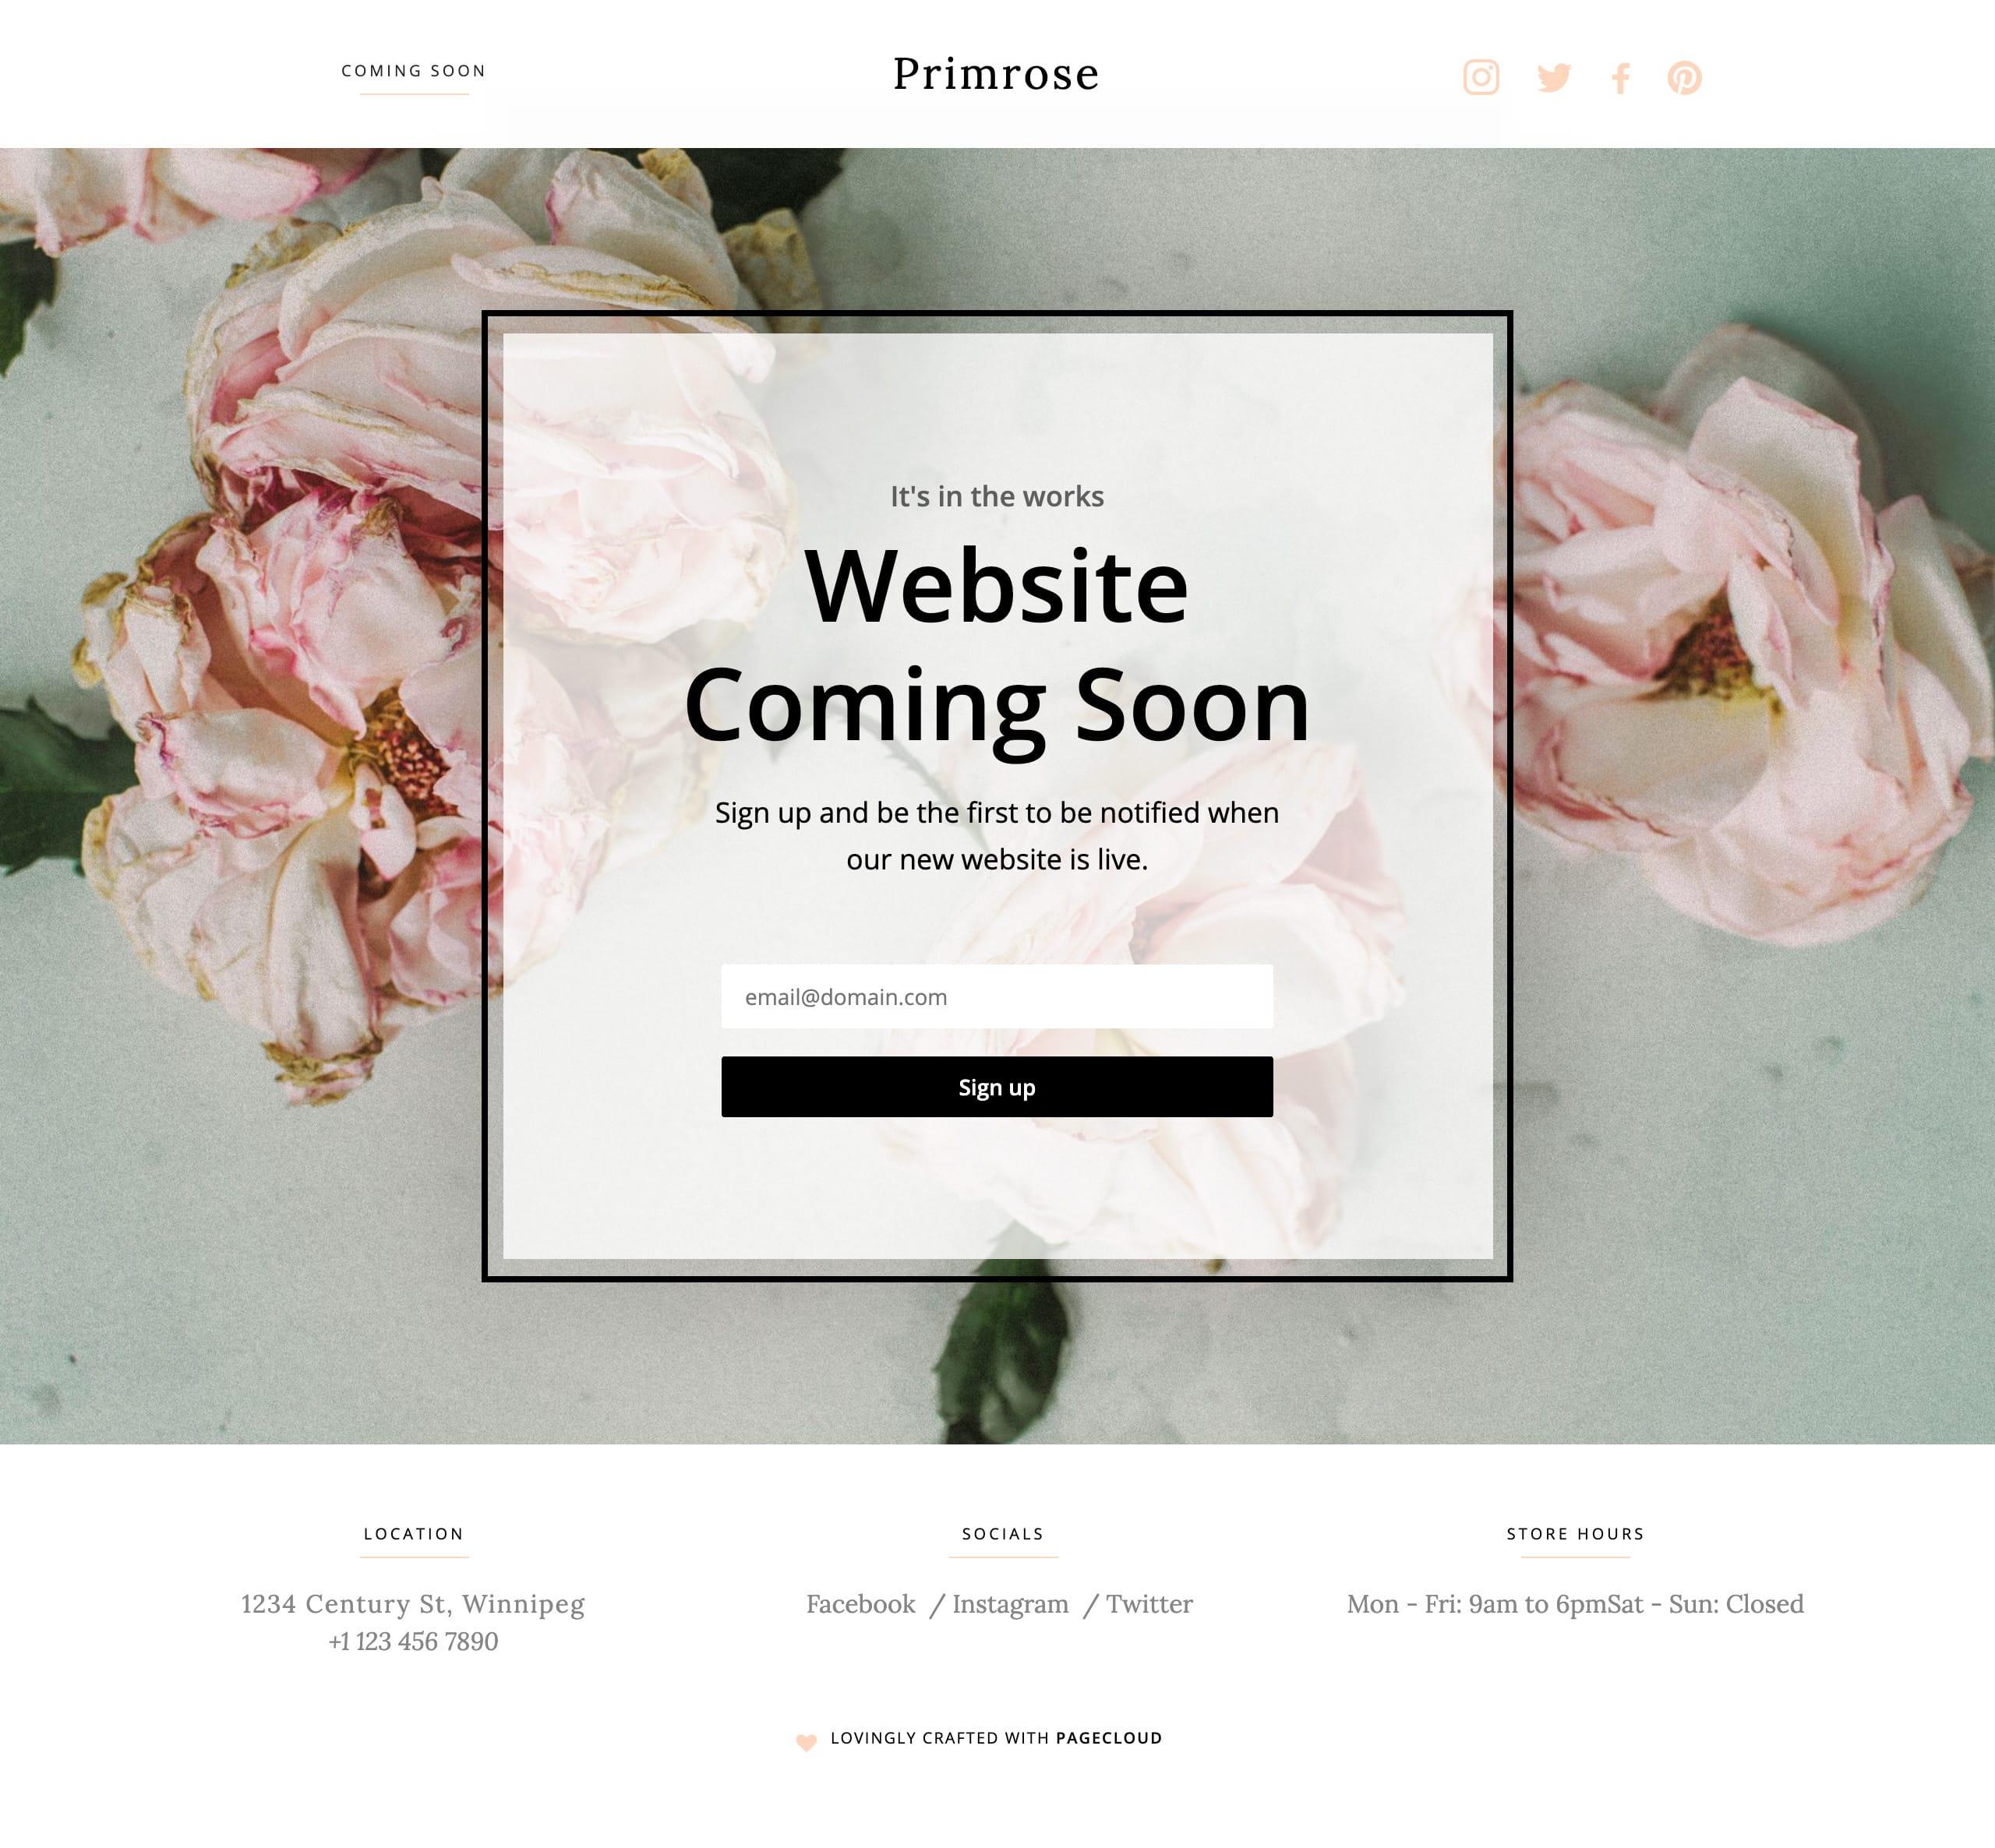 Primrose Website Screenshot